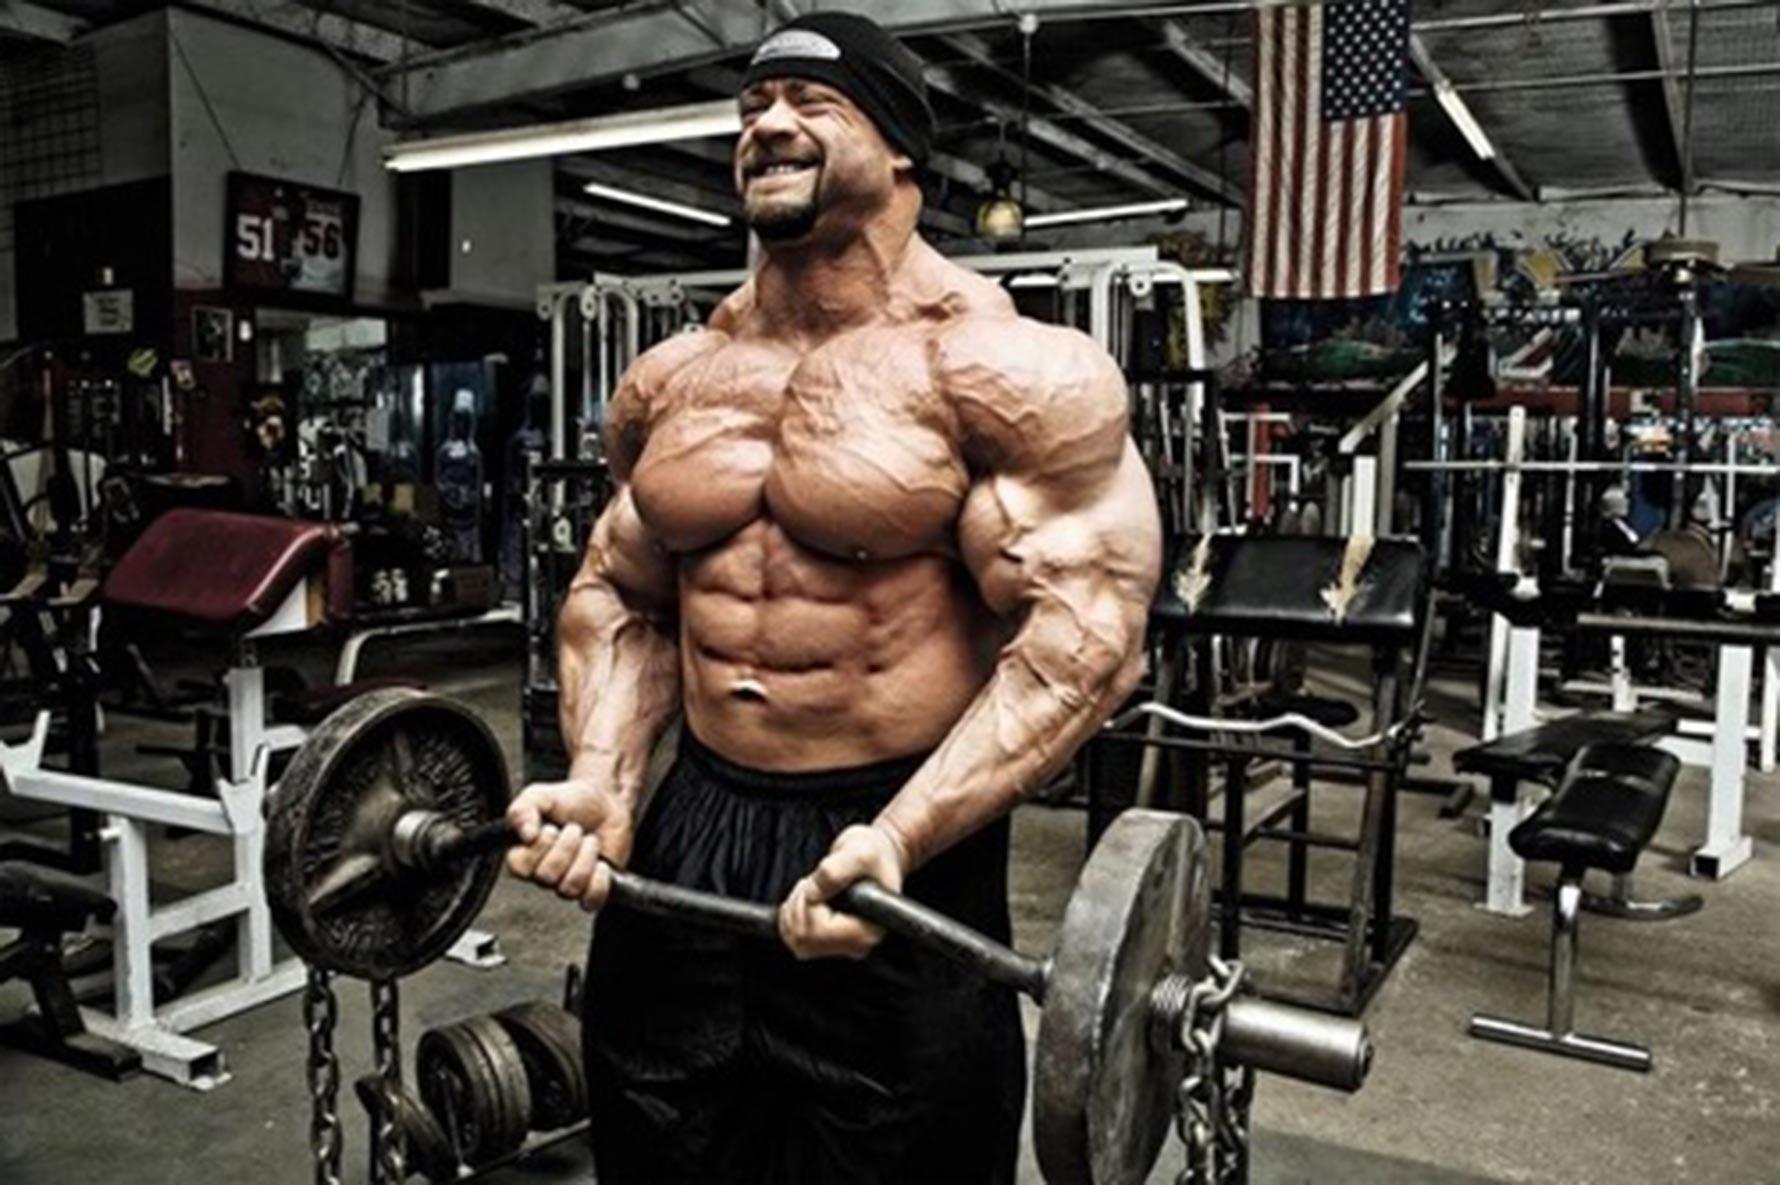 does branch warren use steroids